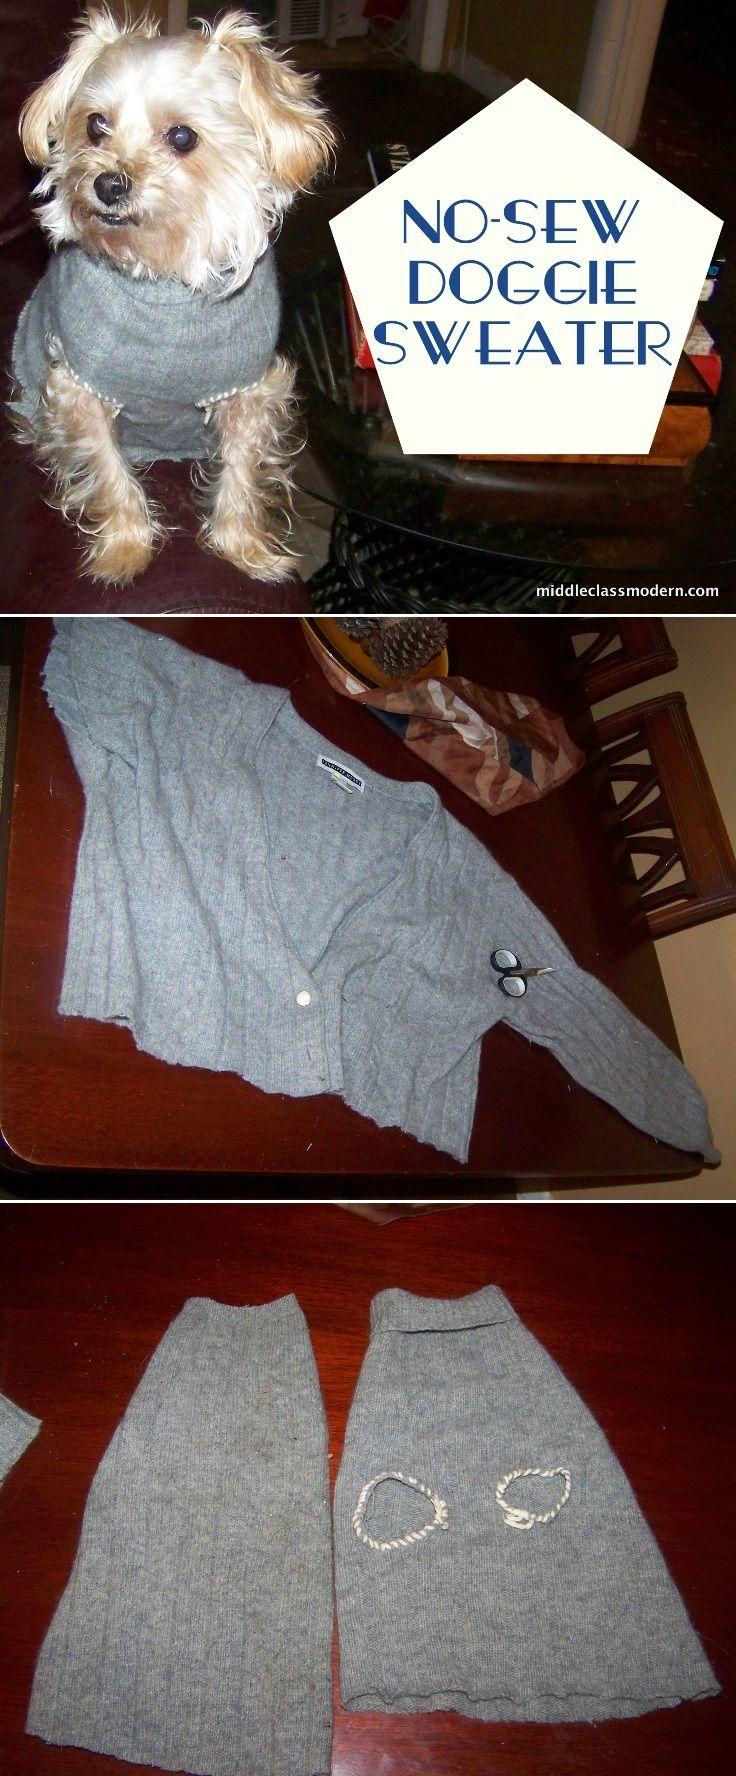 No-Sew Doggie Sweater